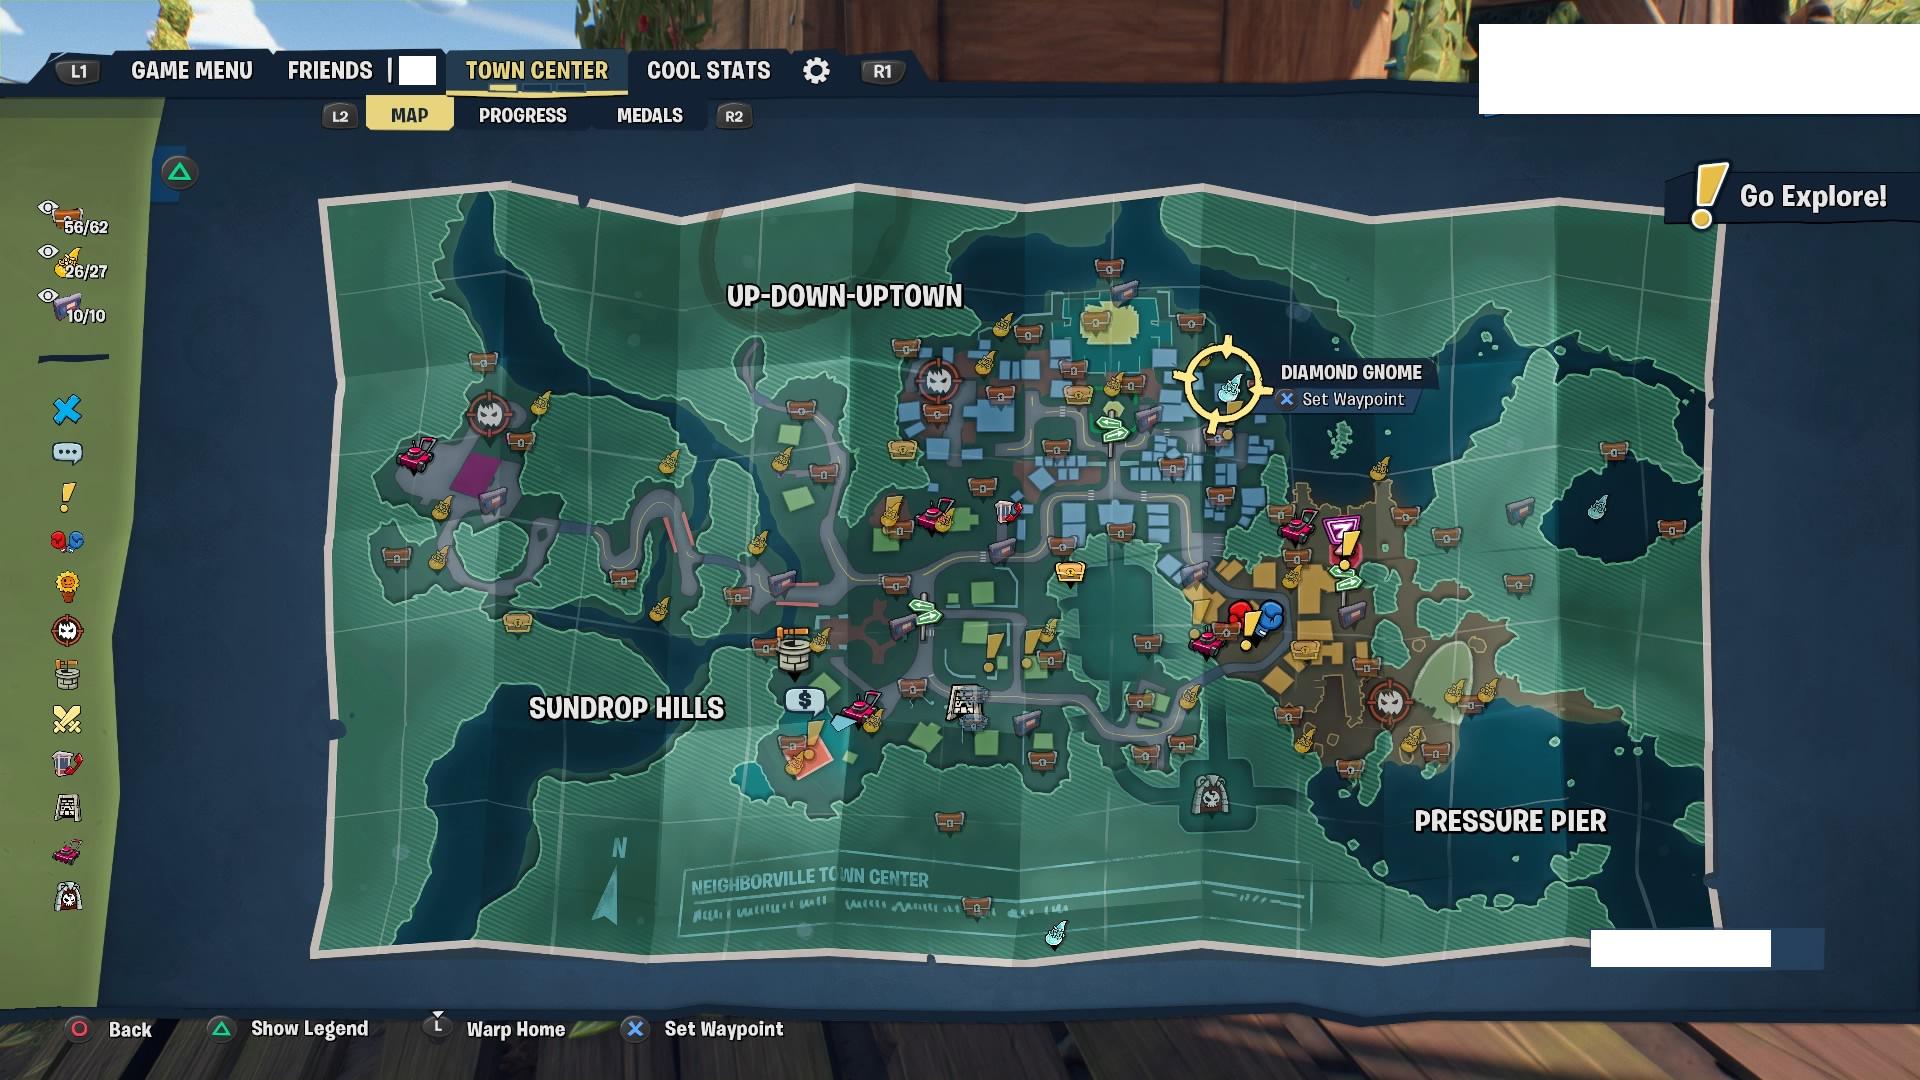 First plants vs zombies garden warfare 3 screens leeked - Plants versus zombies garden warfare ...